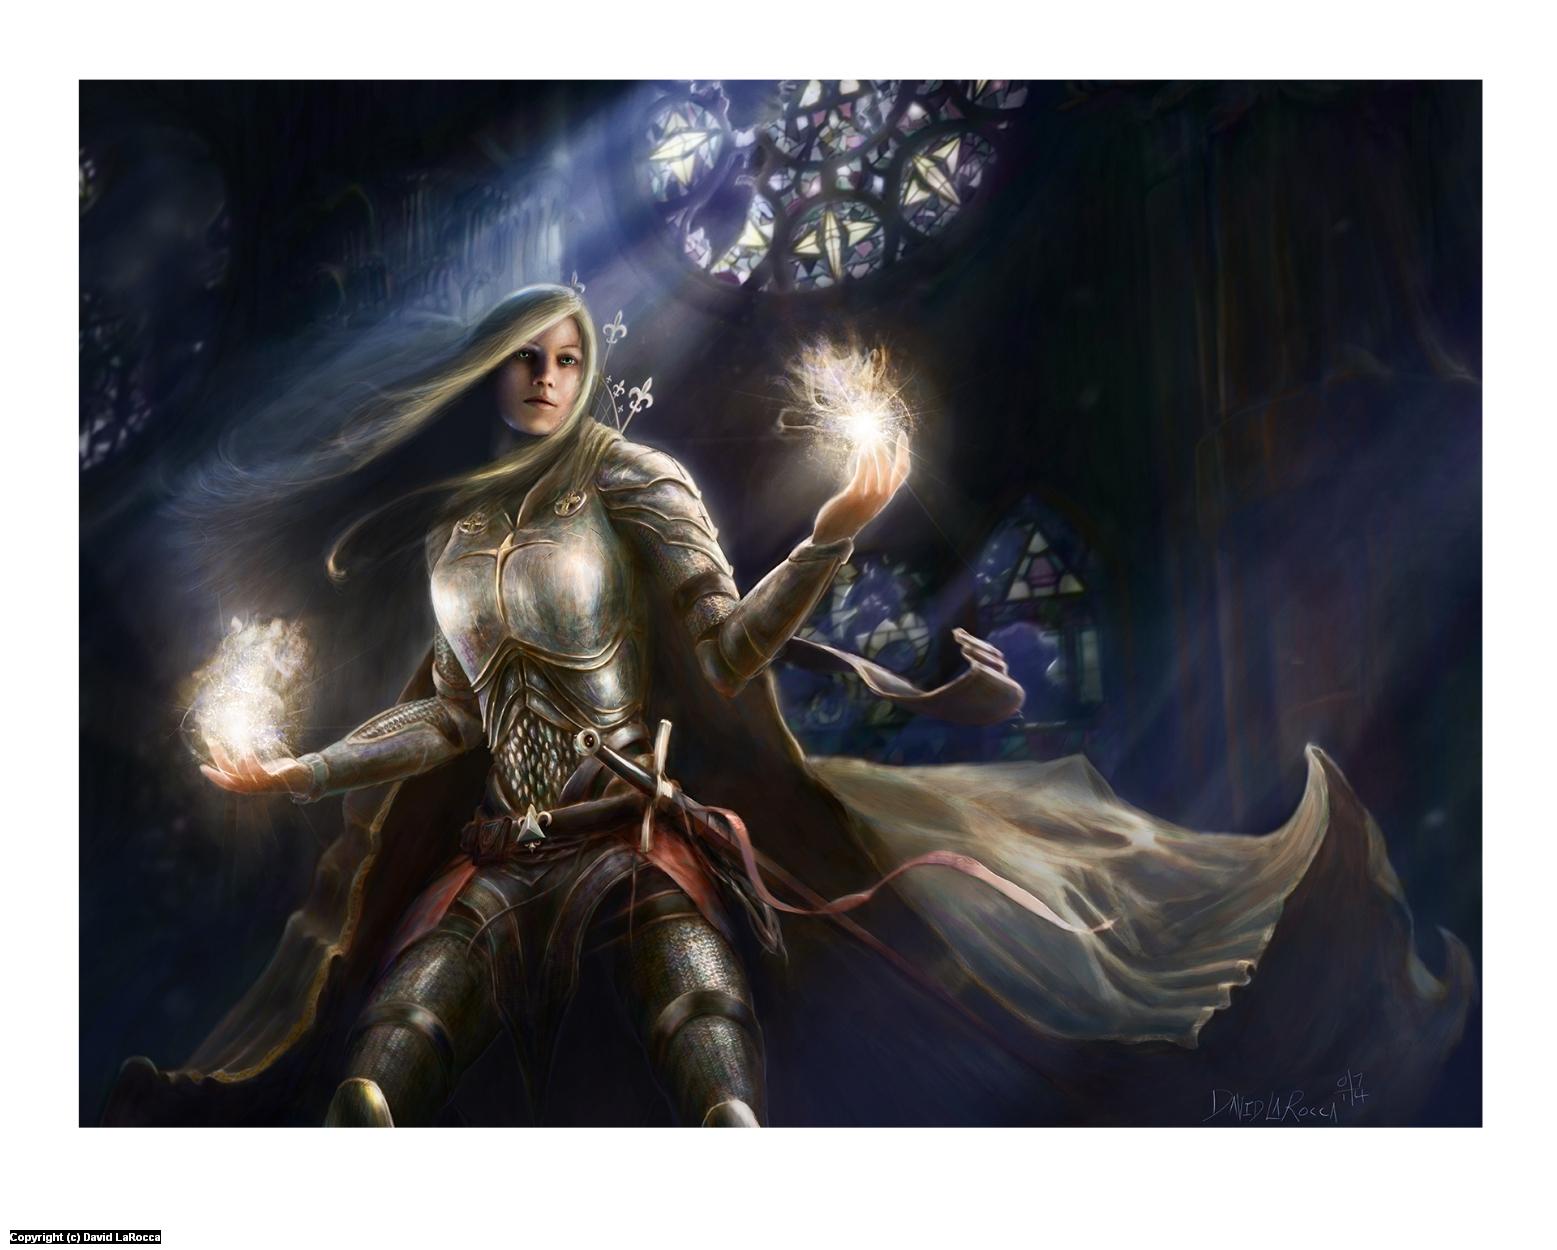 Champion of Light Artwork by David LaRocca